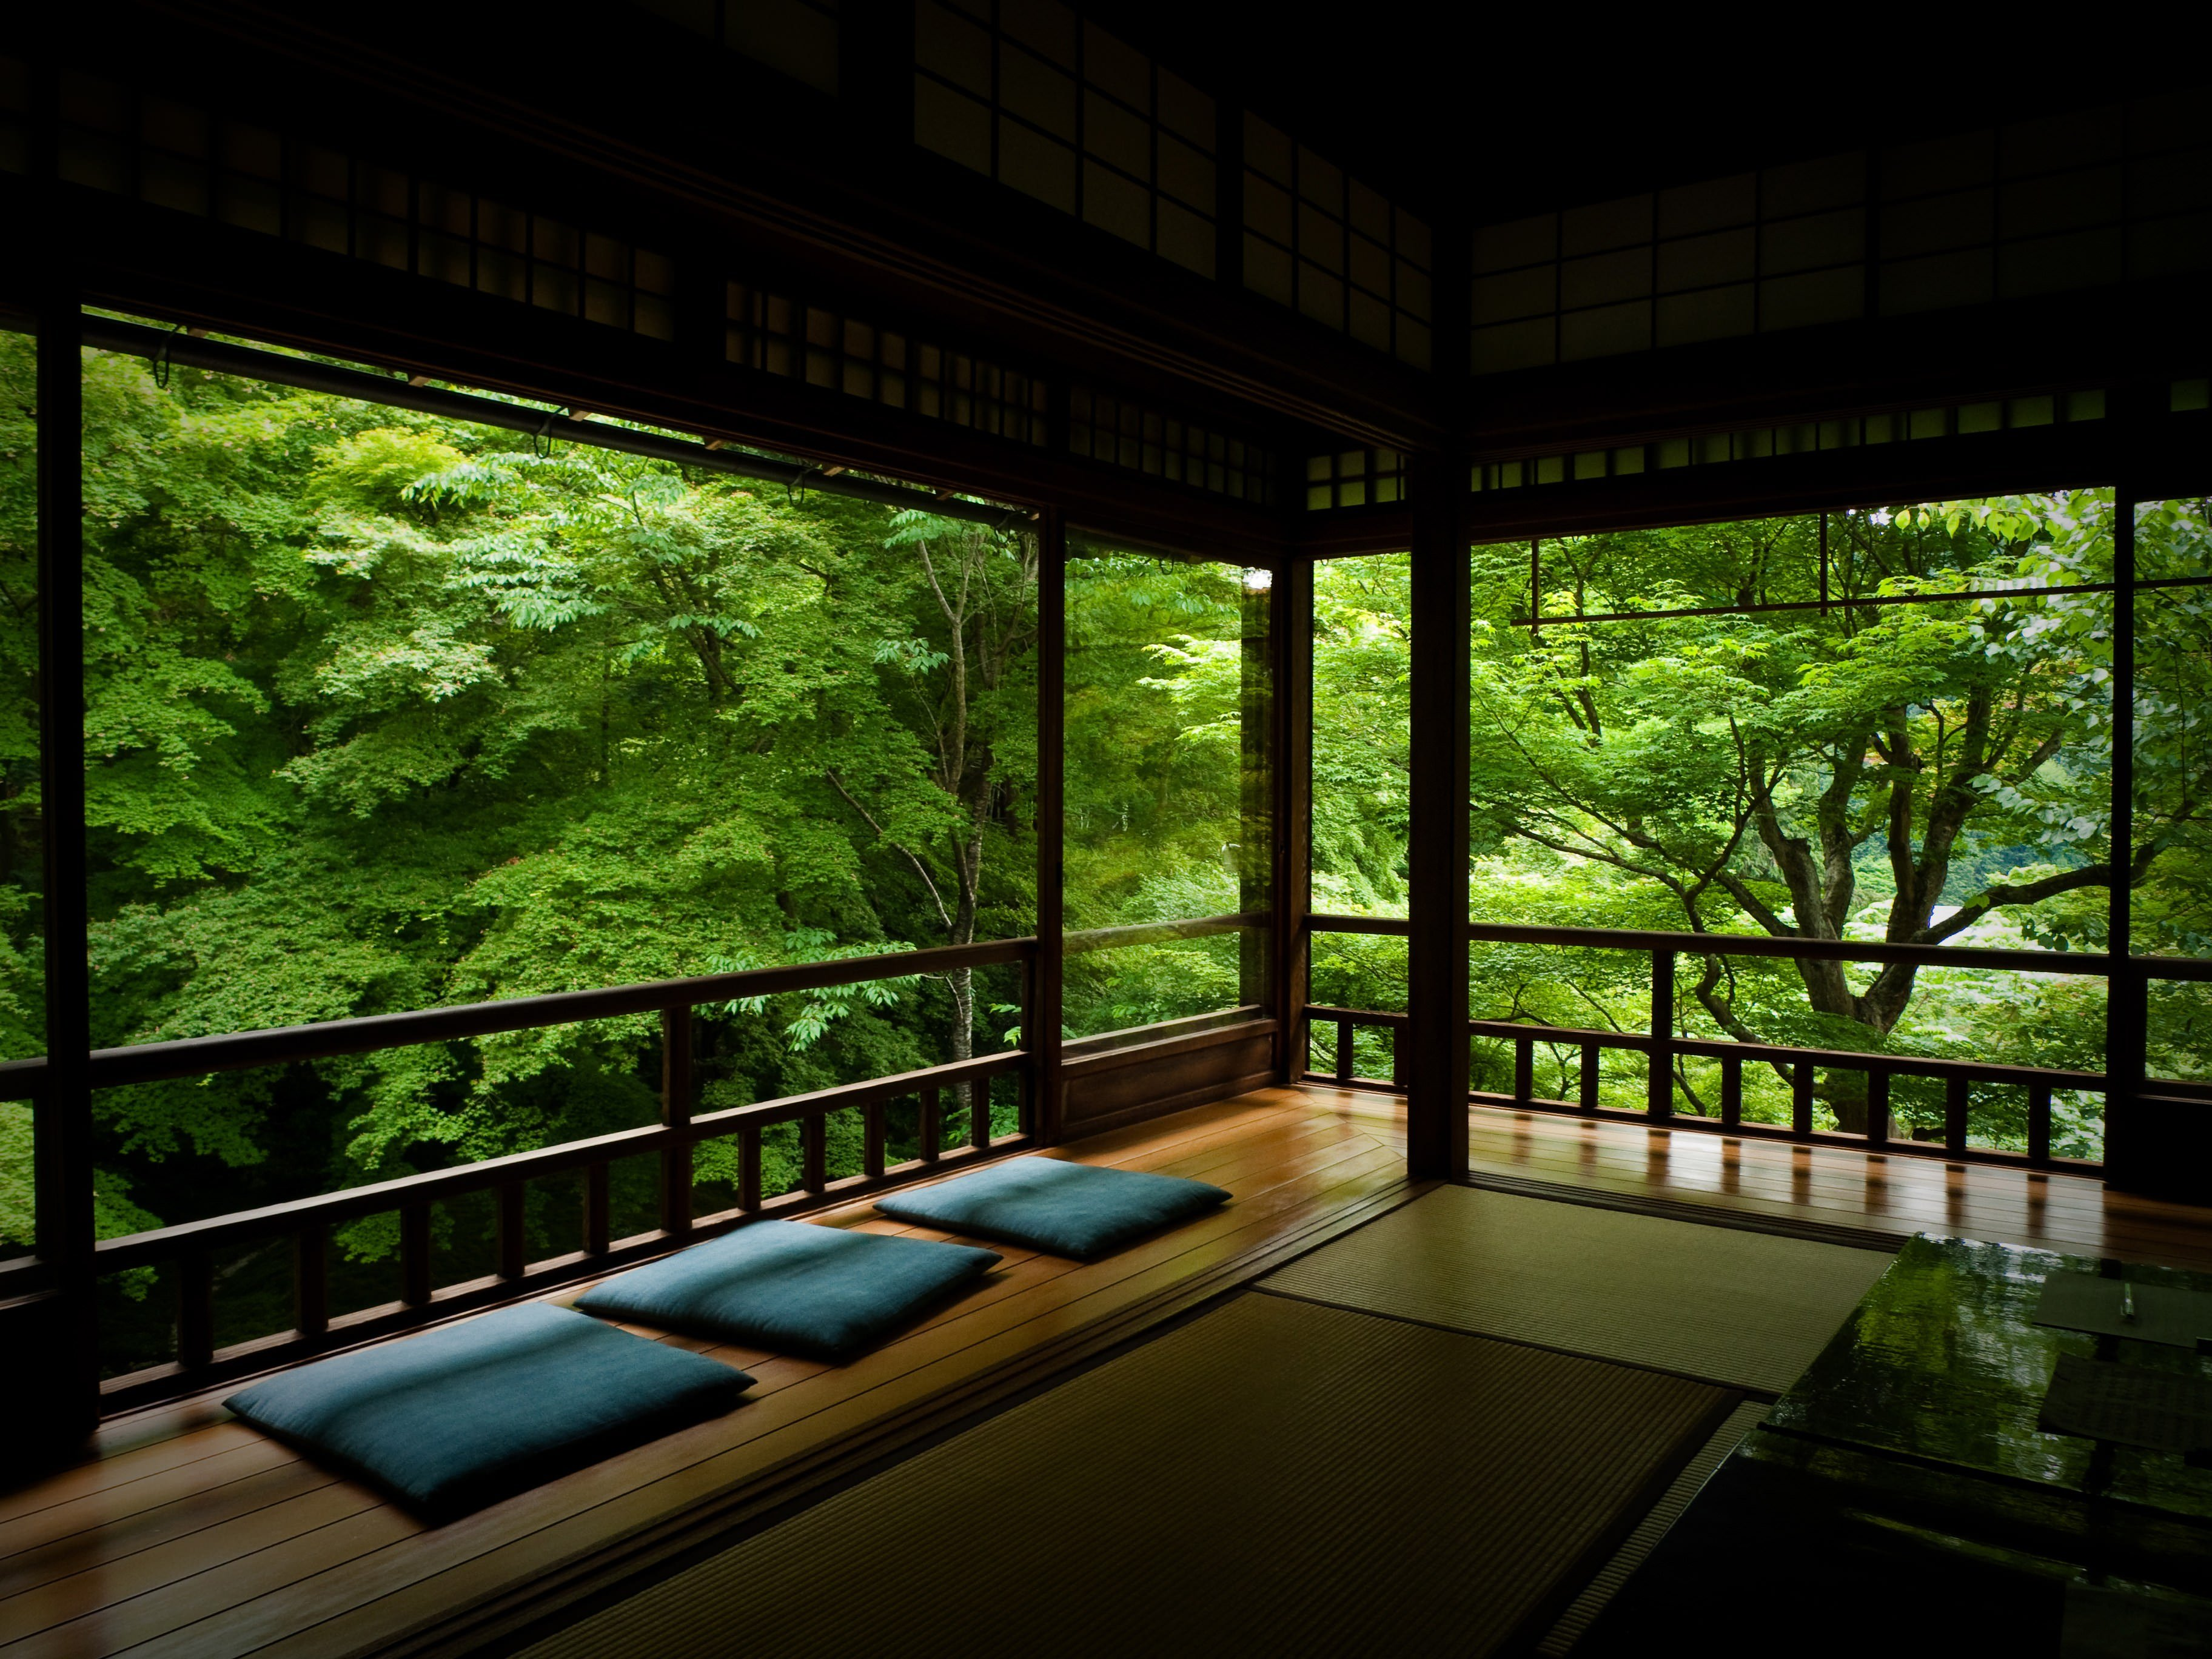 Japanese Tea Room Hd Wallpaper